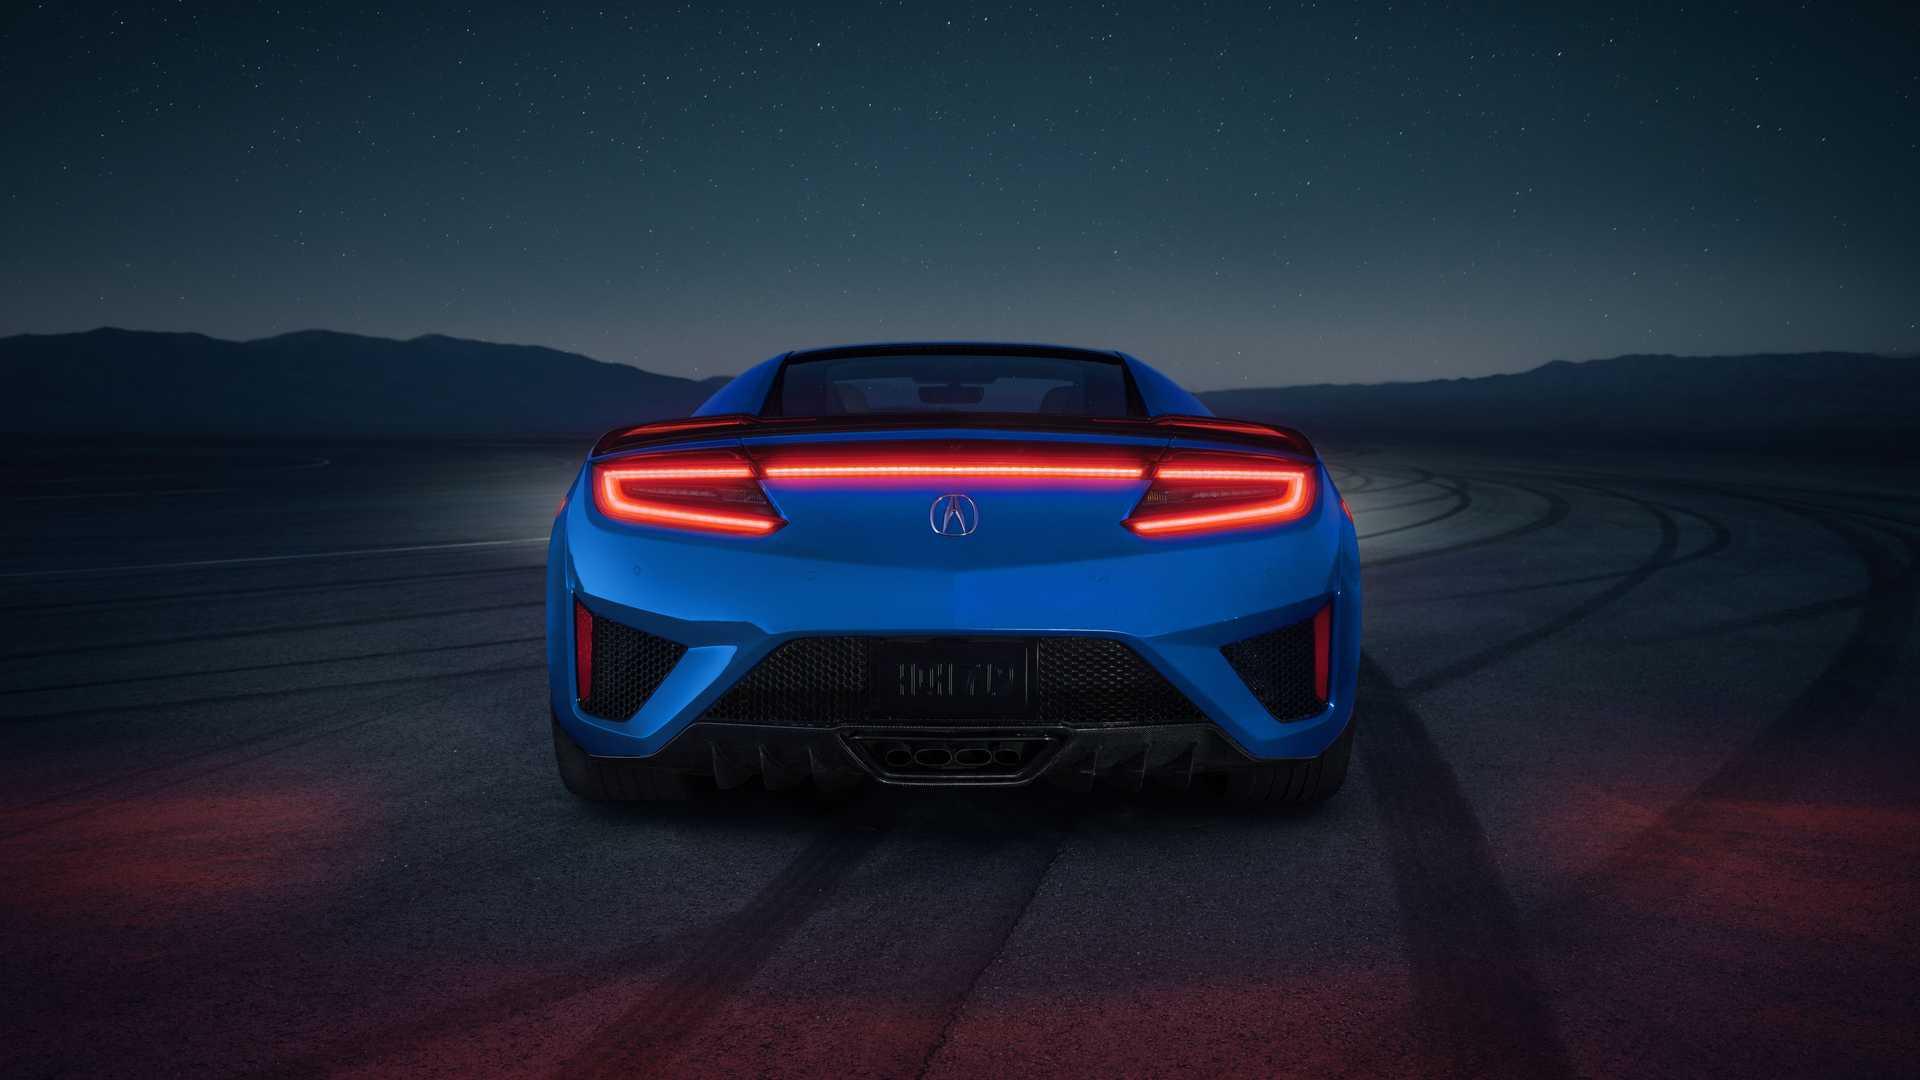 2021 Honda Nsx Looks Retrotastic With Long Beach Blue Pearl Paint